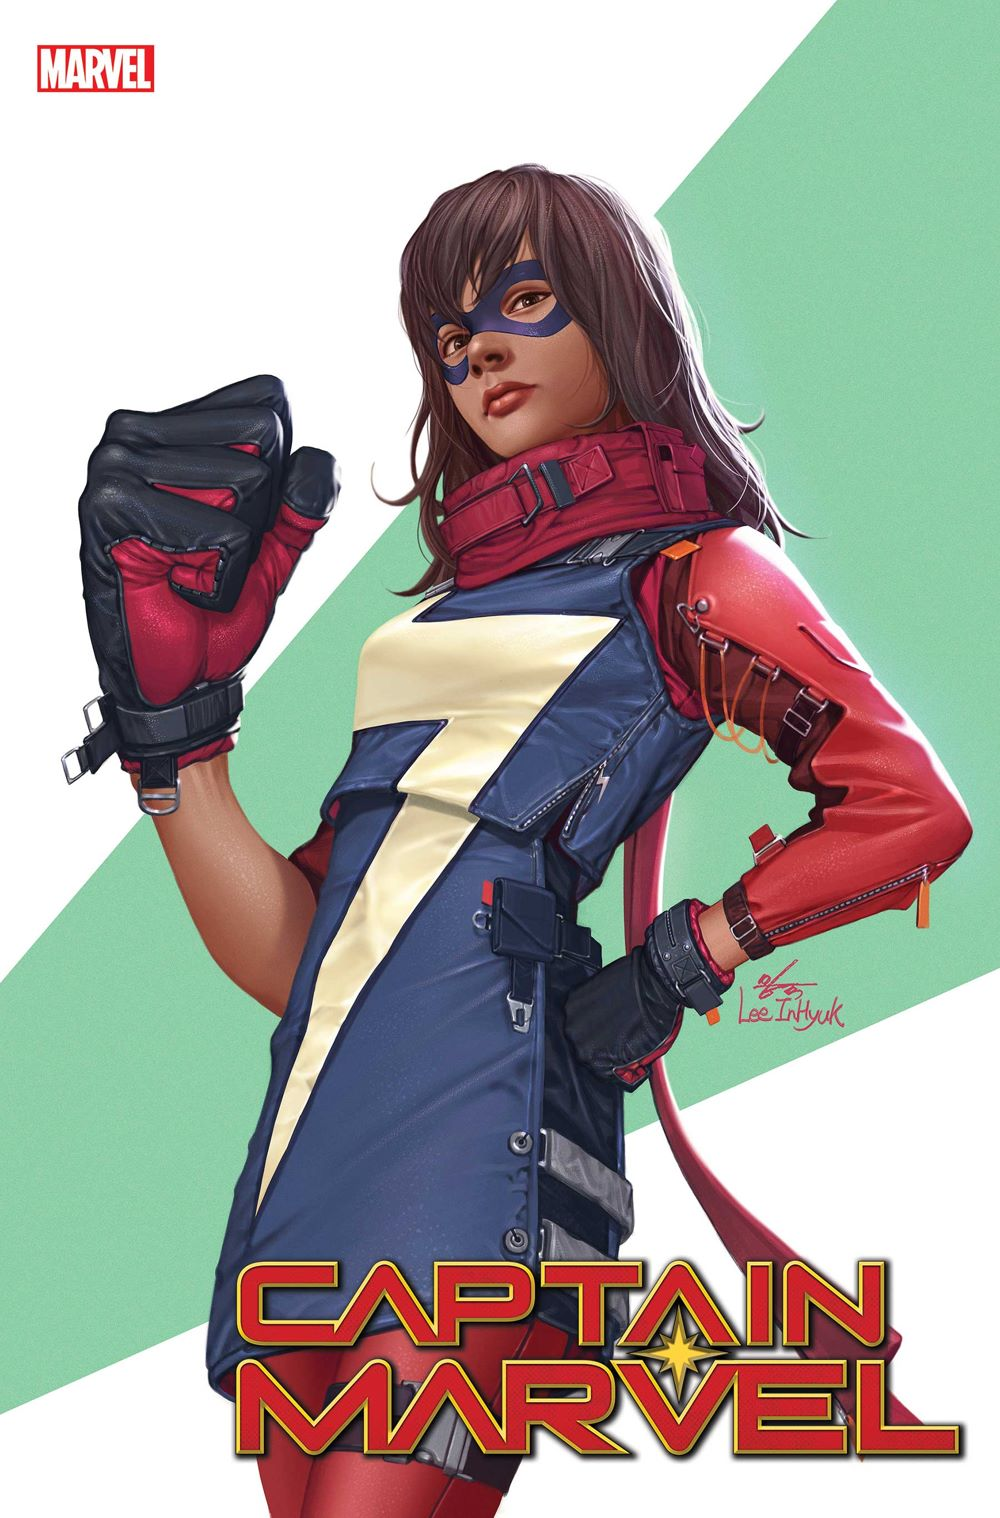 CAPMARV2019031_InHyuk_Lee_VAR-1 Marvel Comics August 2021 Solicitations